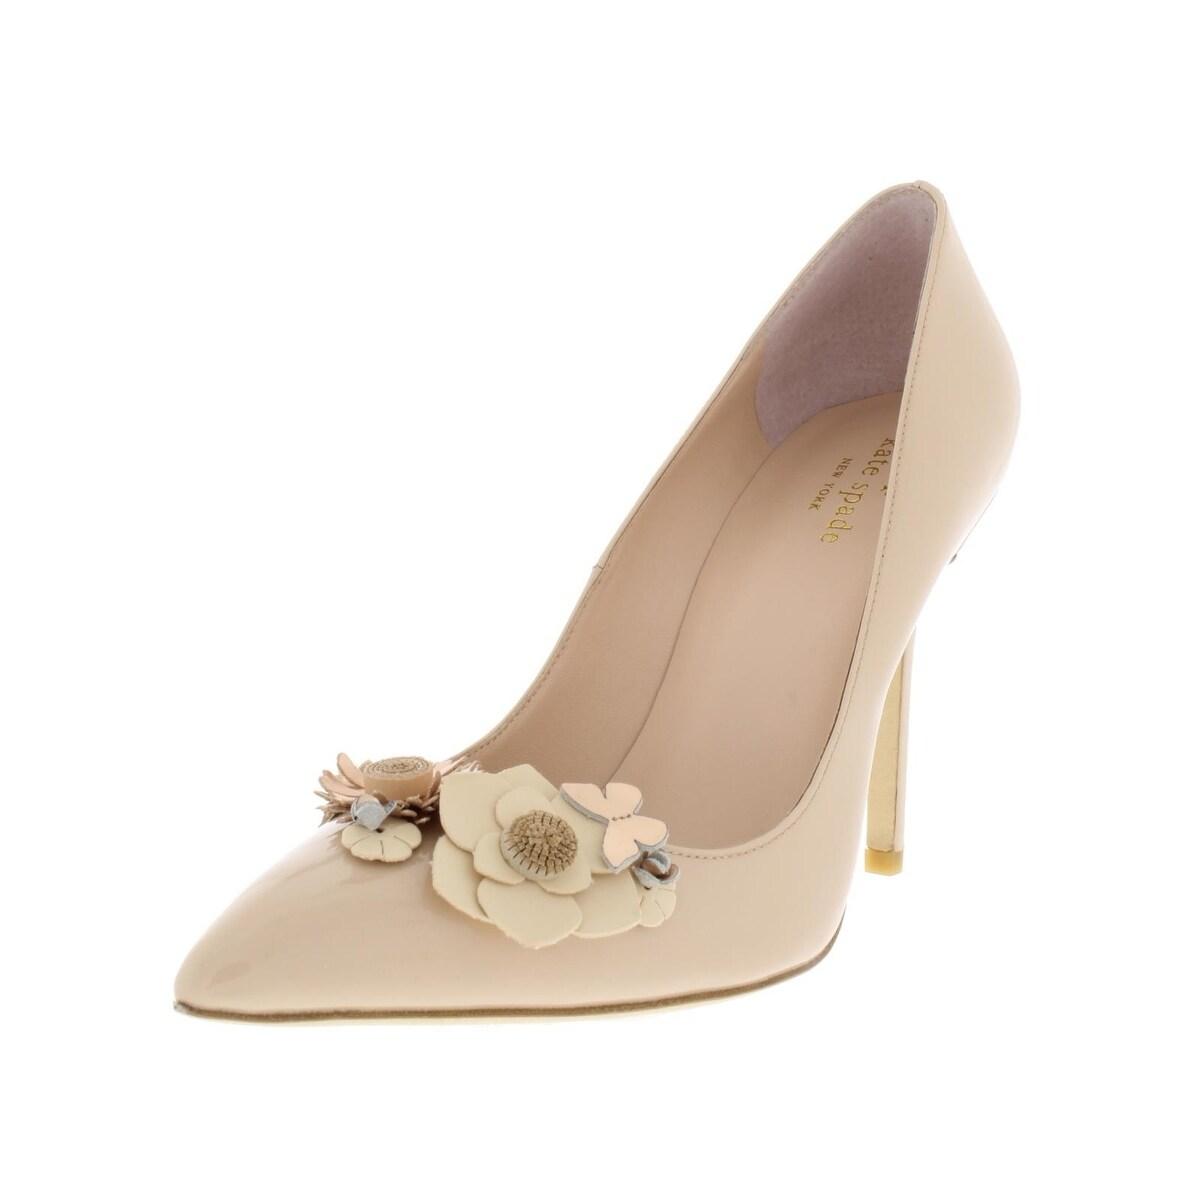 a8efe83e690 Buy Kate Spade Women s Heels Online at Overstock